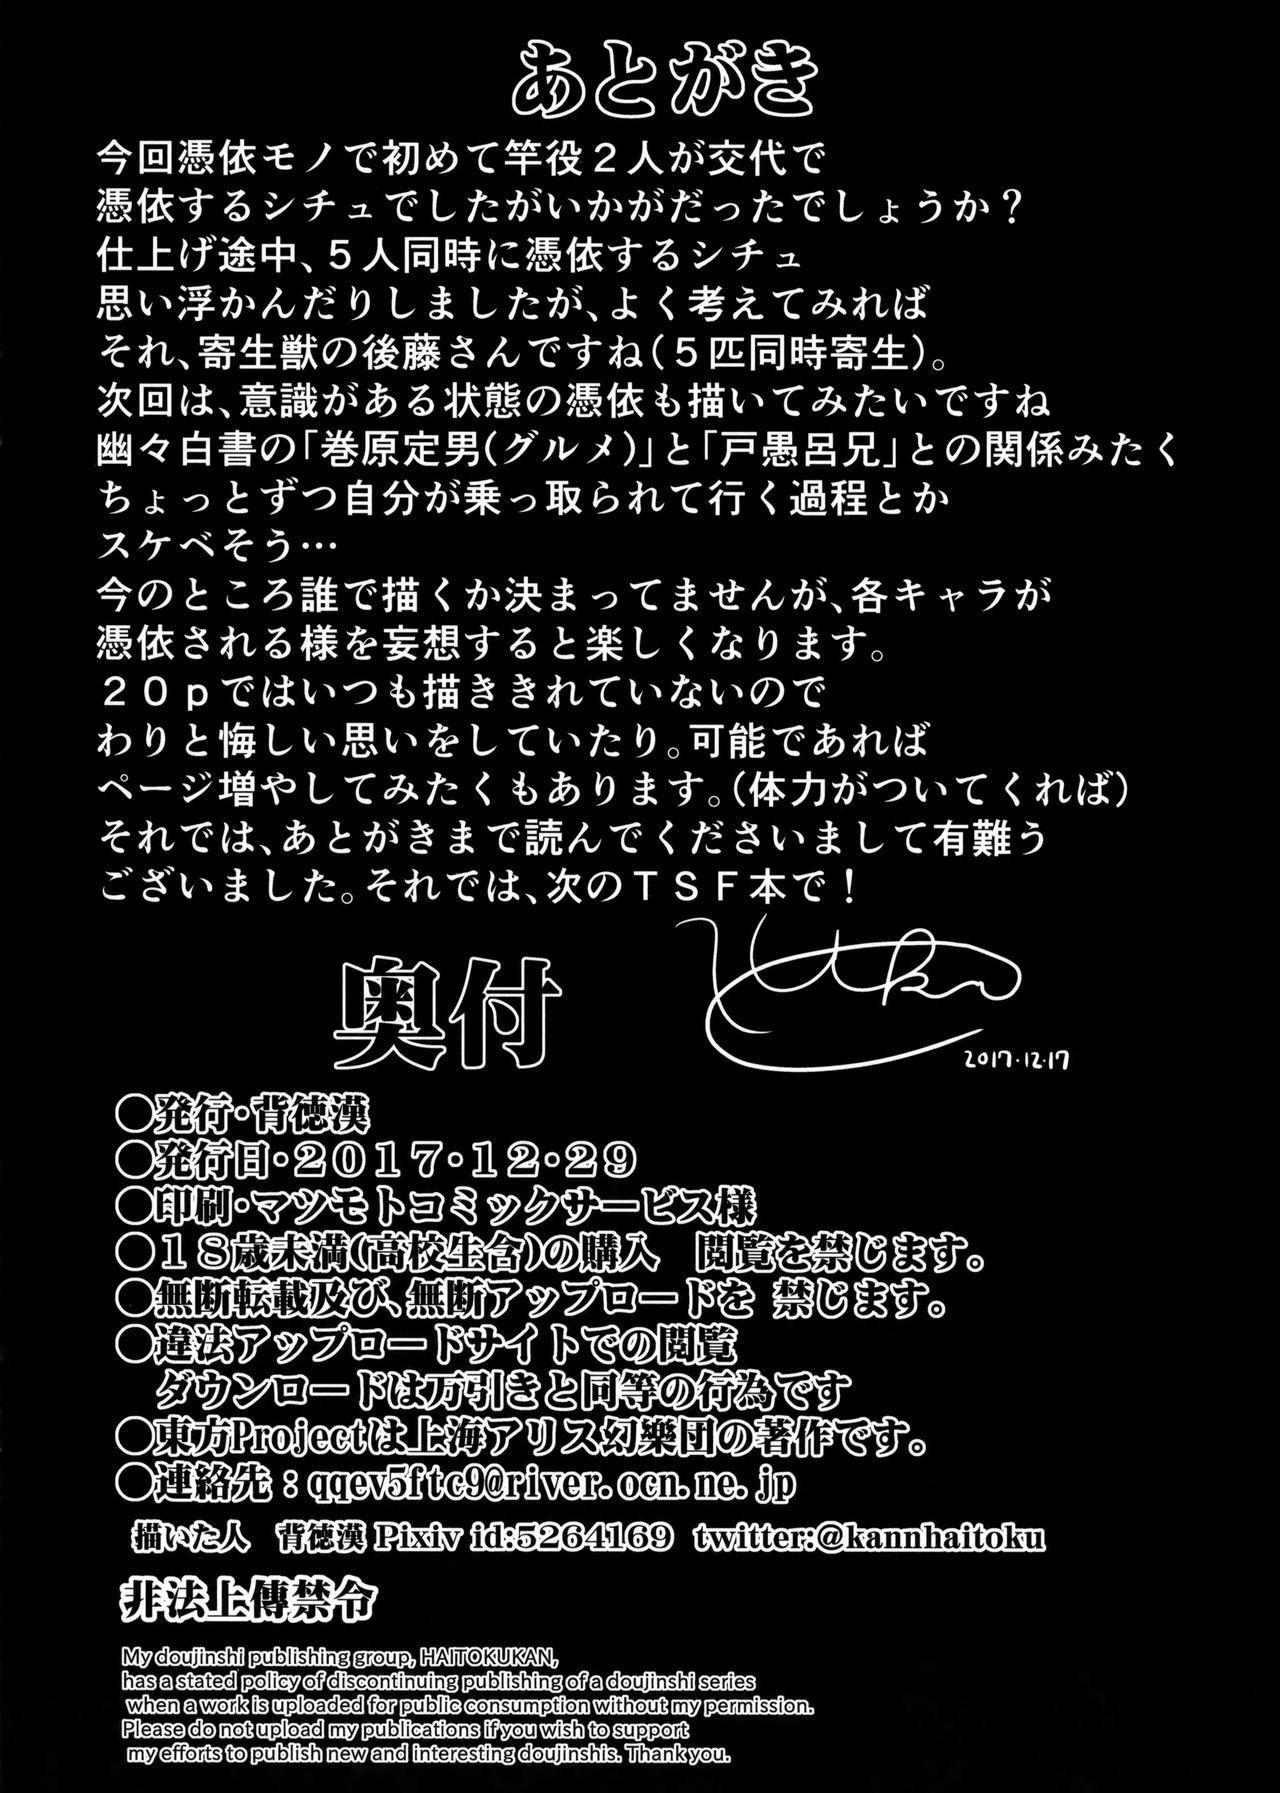 Touhou TSF 3 Sakuya ni Hyoui 20